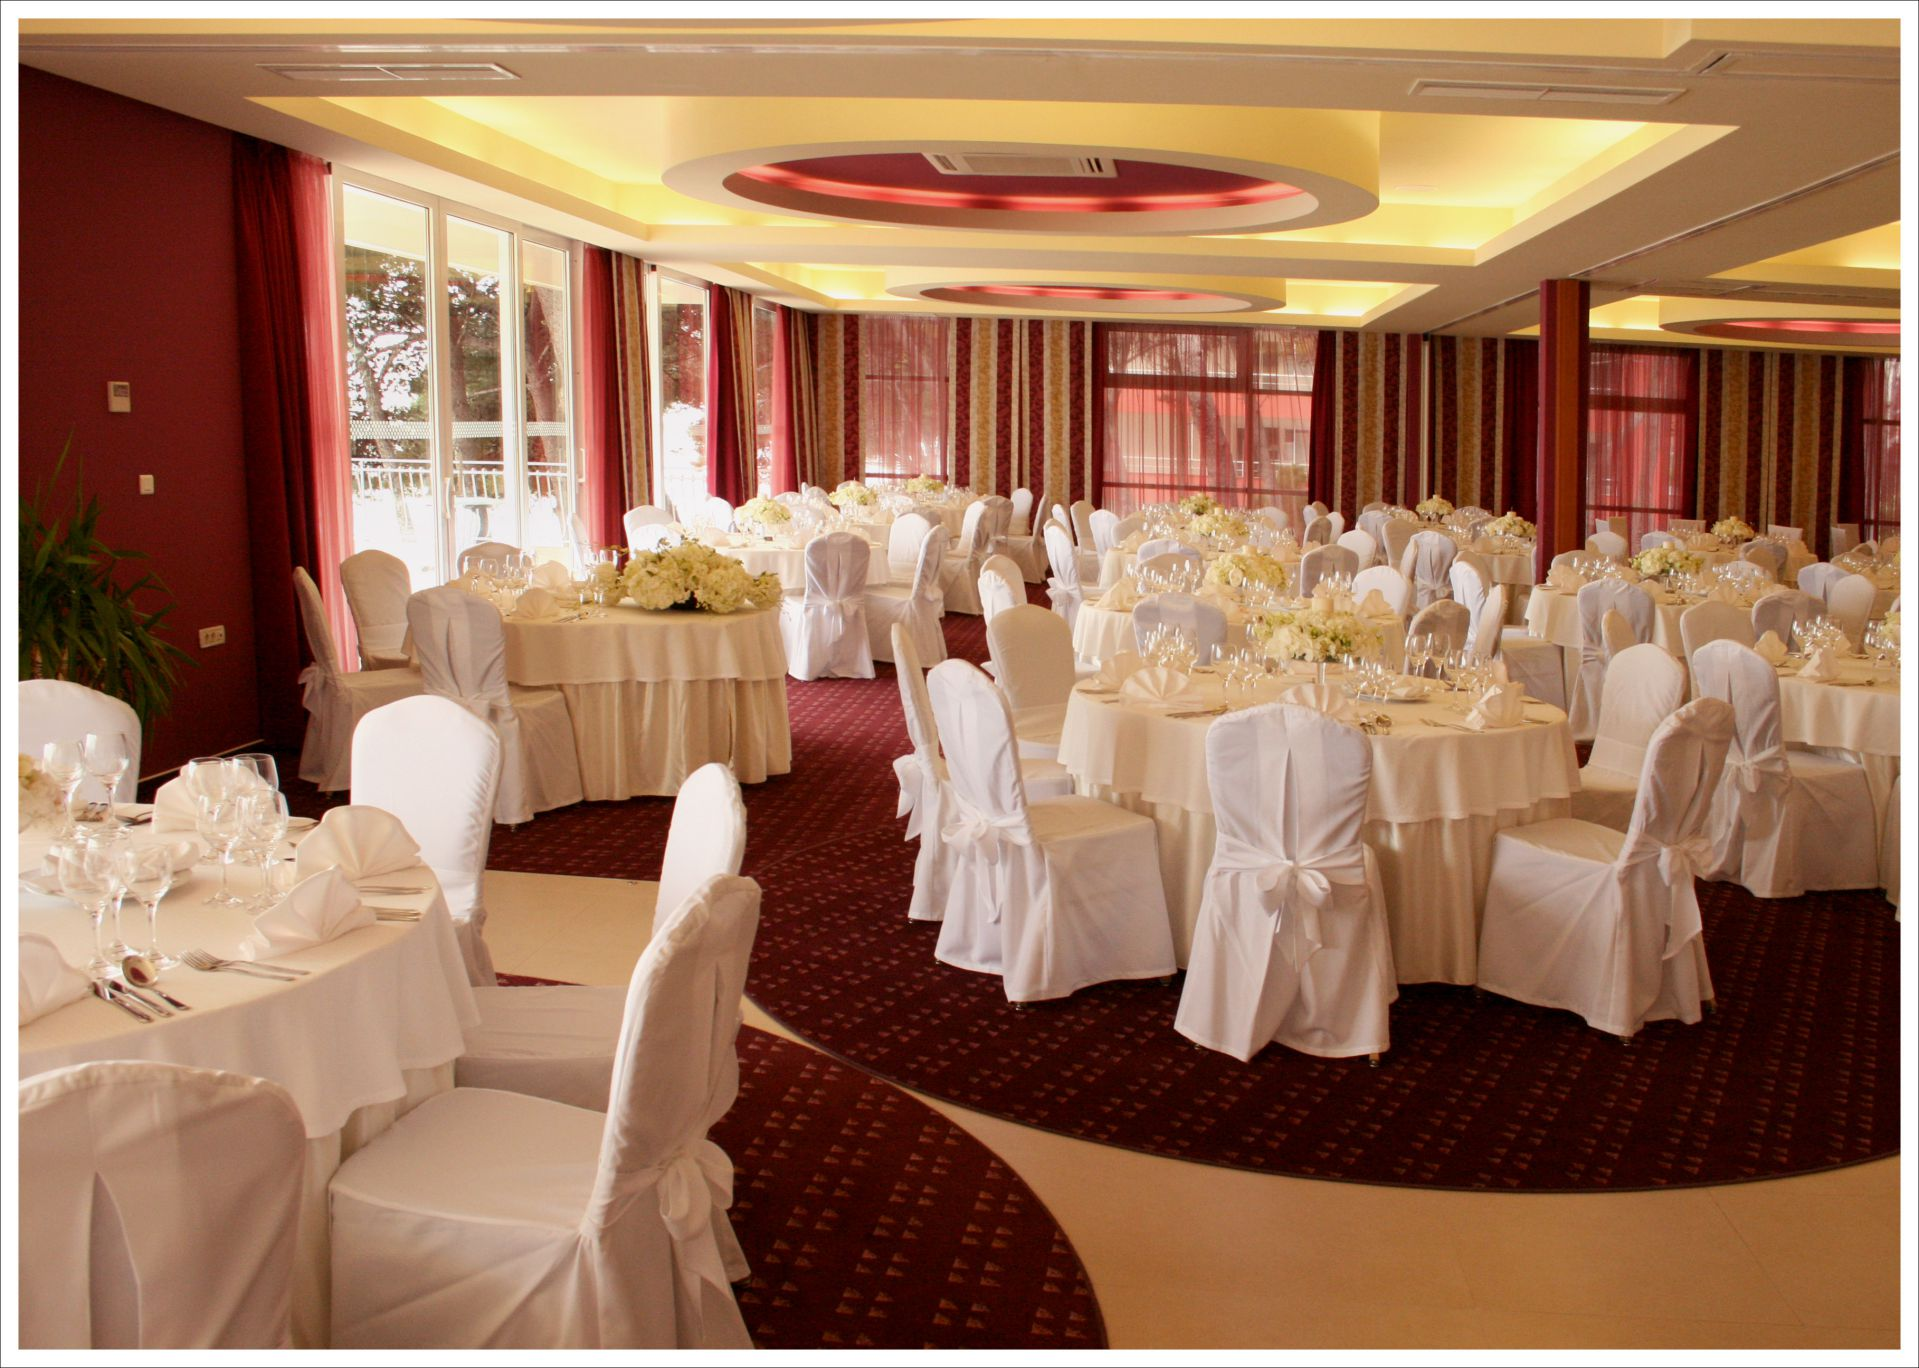 wedding congress center 14 14823223751 o - Zora Hotel